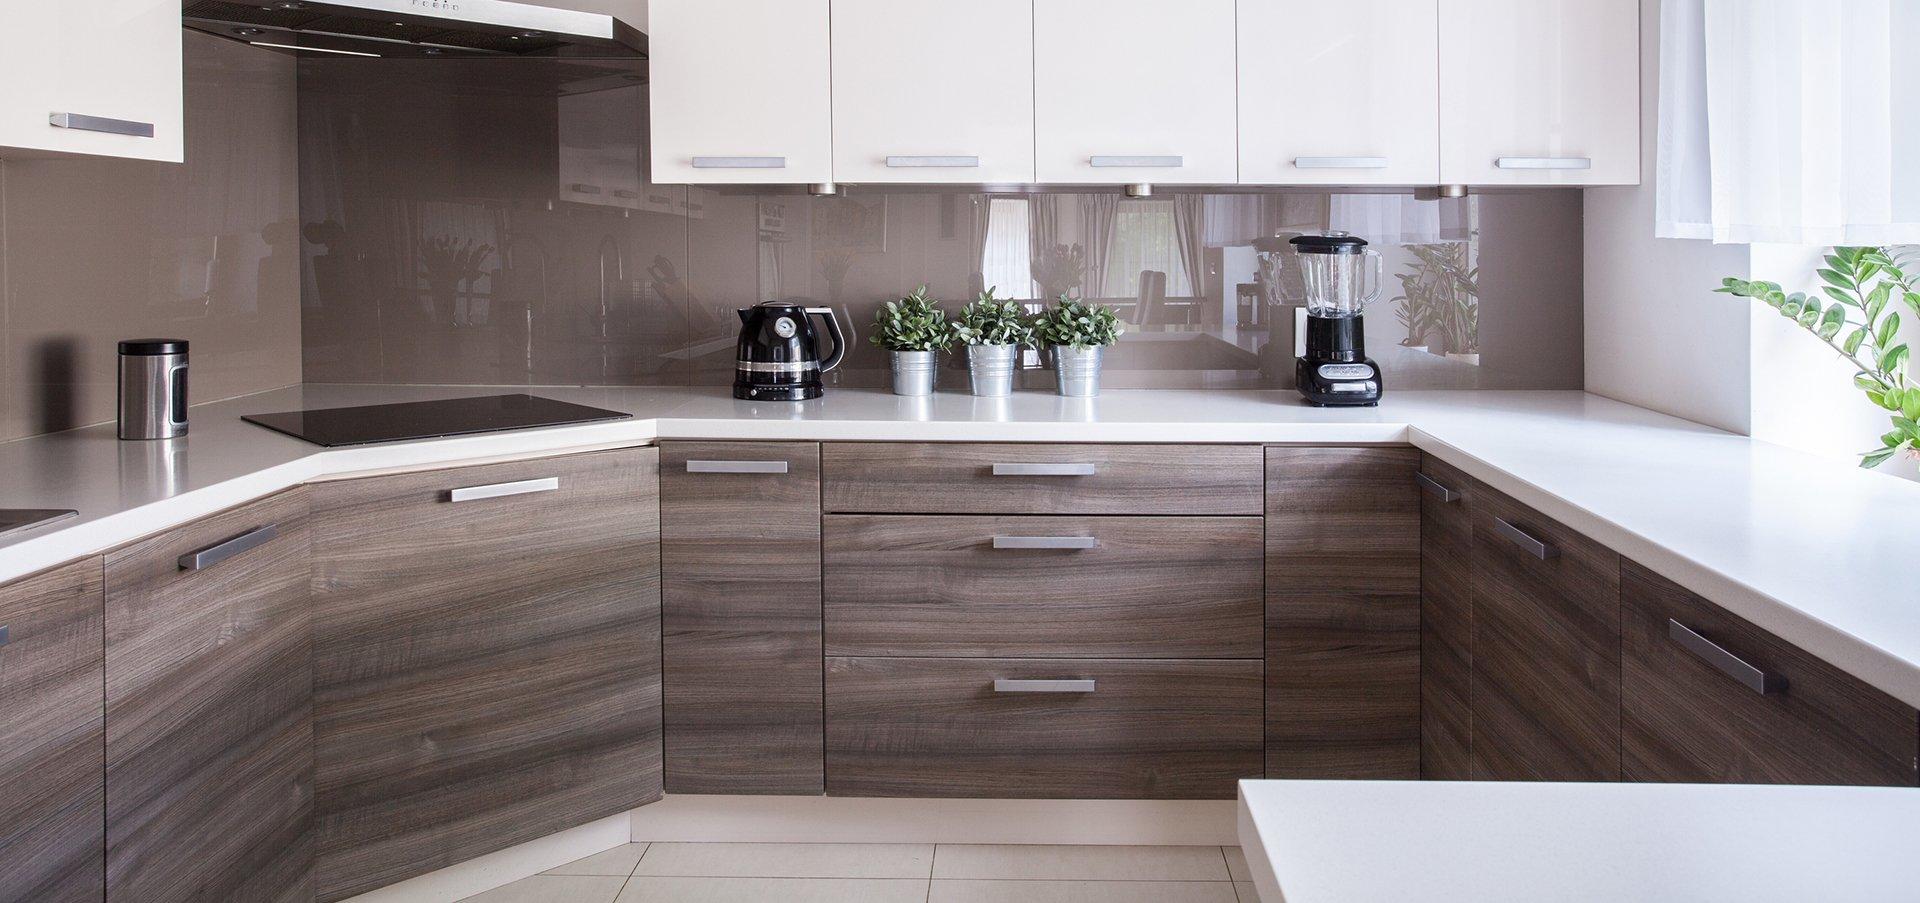 Kitchen Remodeling - San Jose CA, Mountain View CA   Quartz Construction